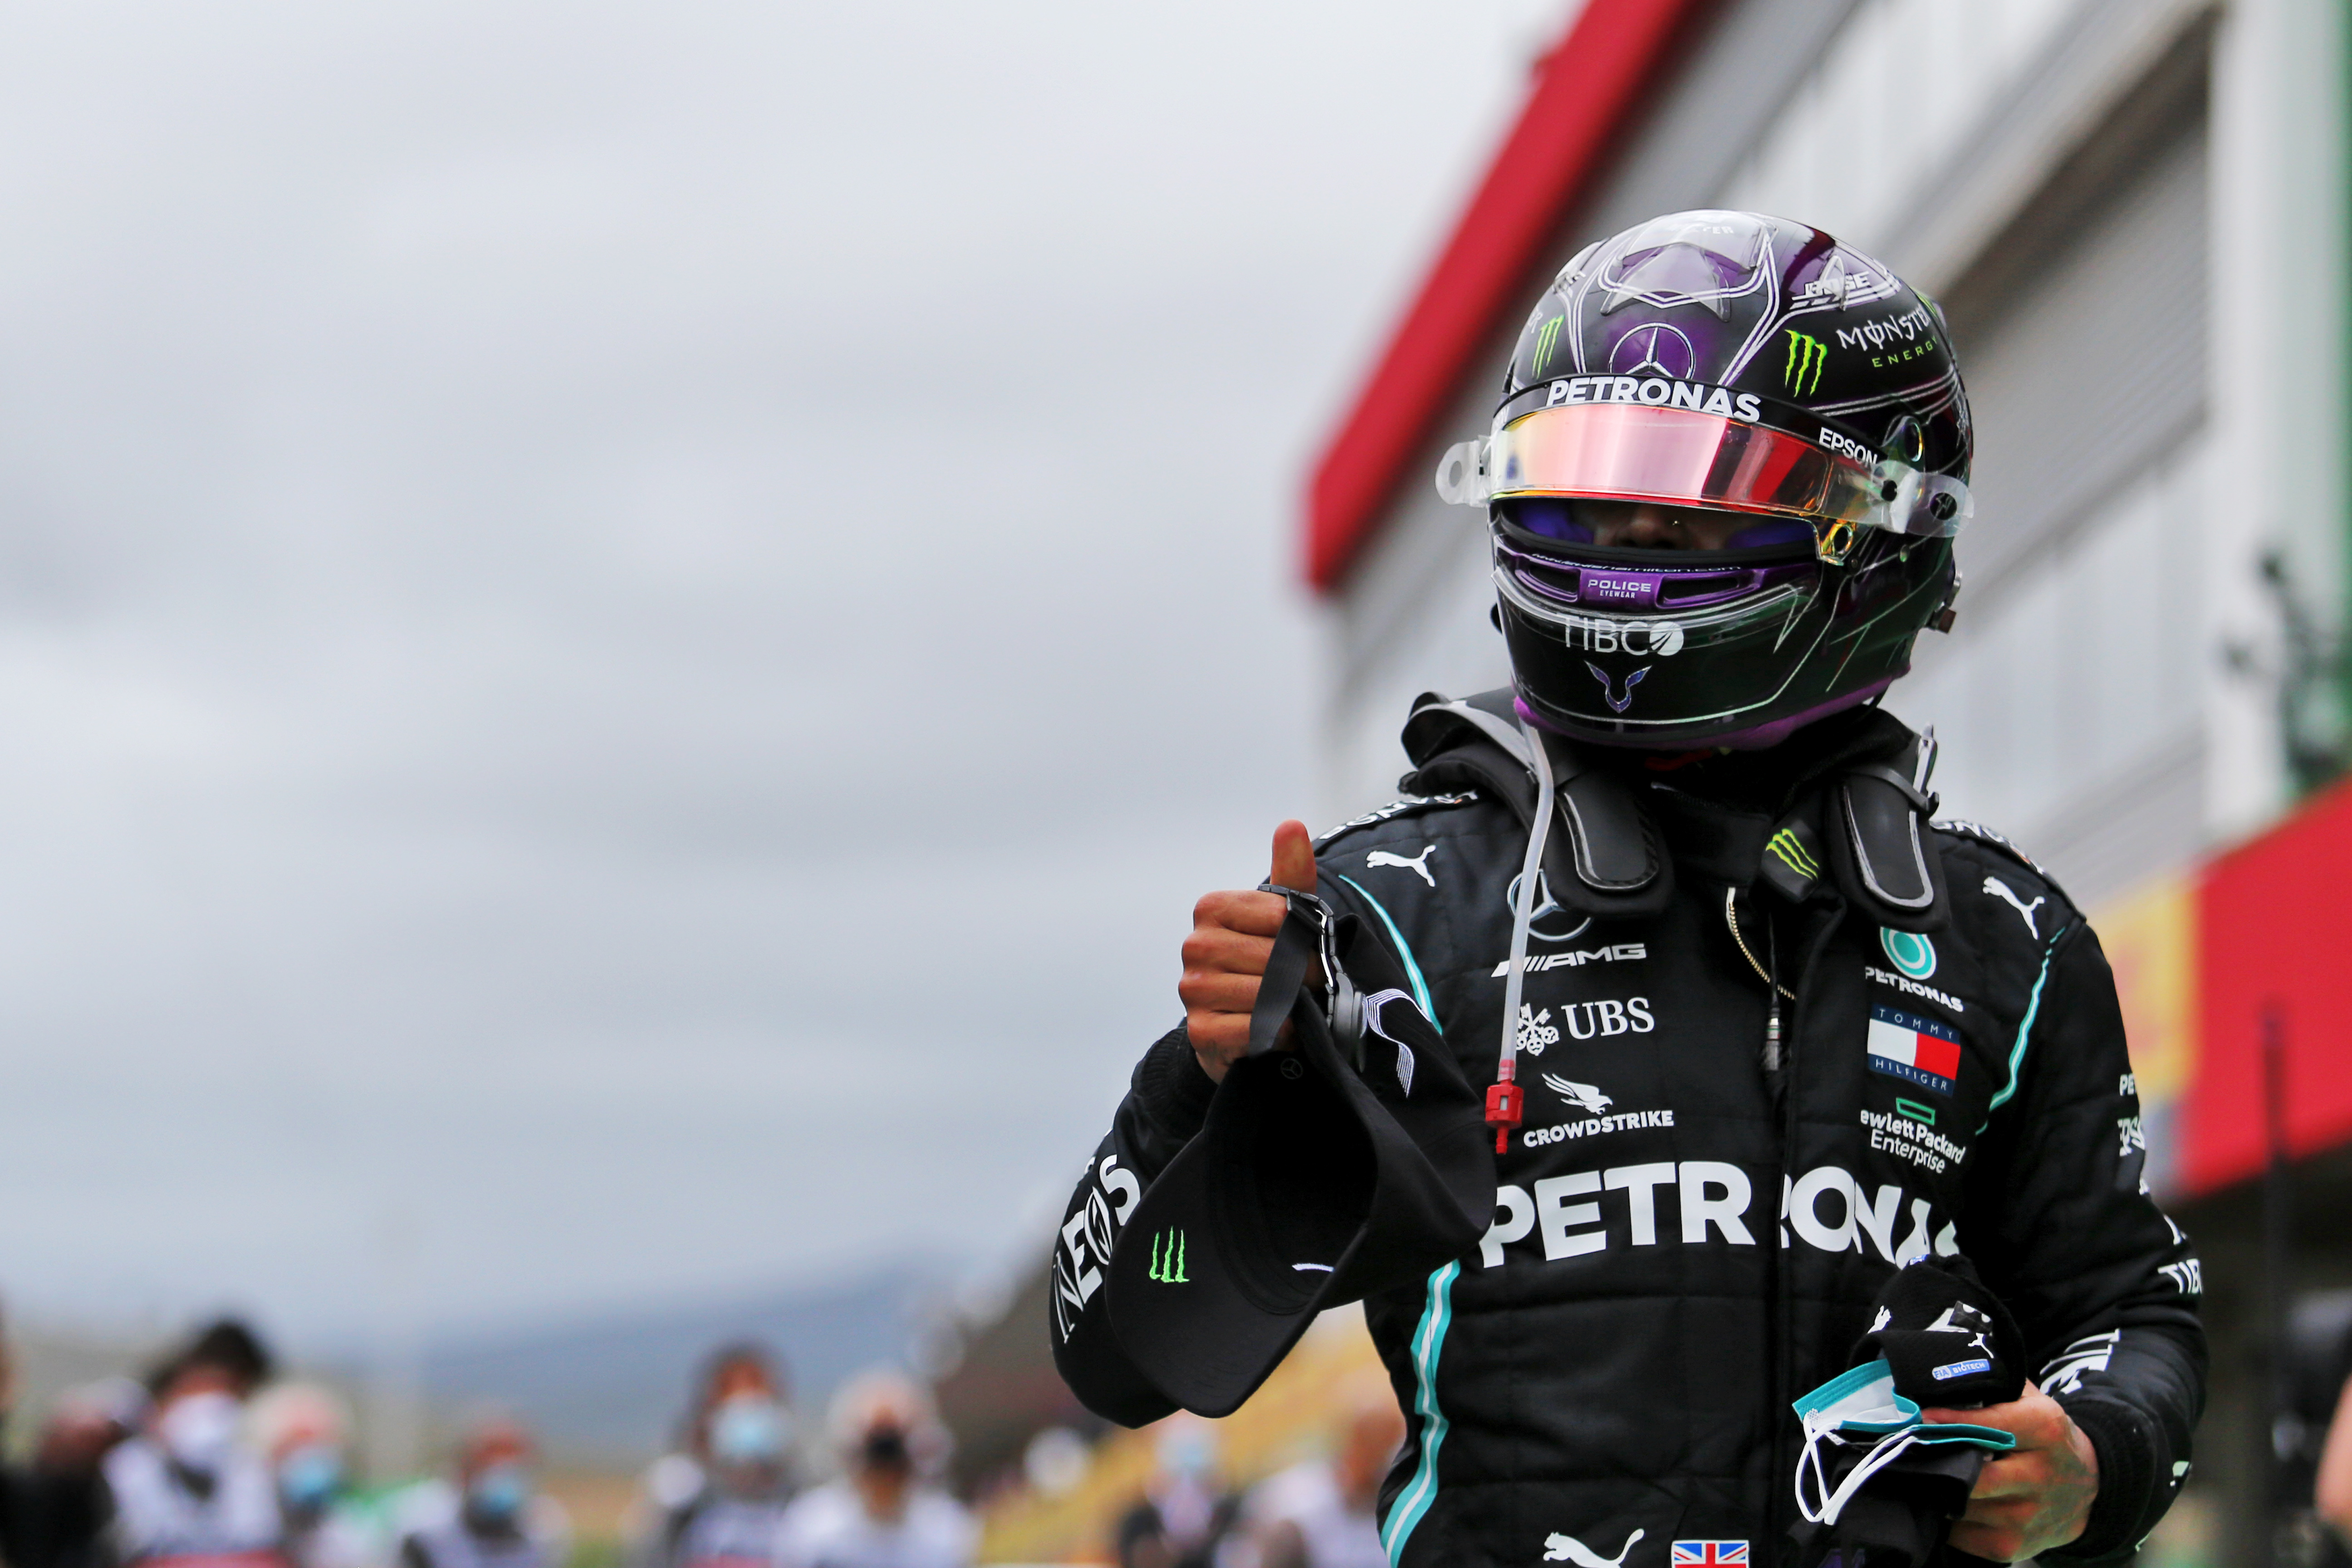 Motor Racing Formula One World Championship Portuguese Grand Prix Race Day Portimao, Portugal